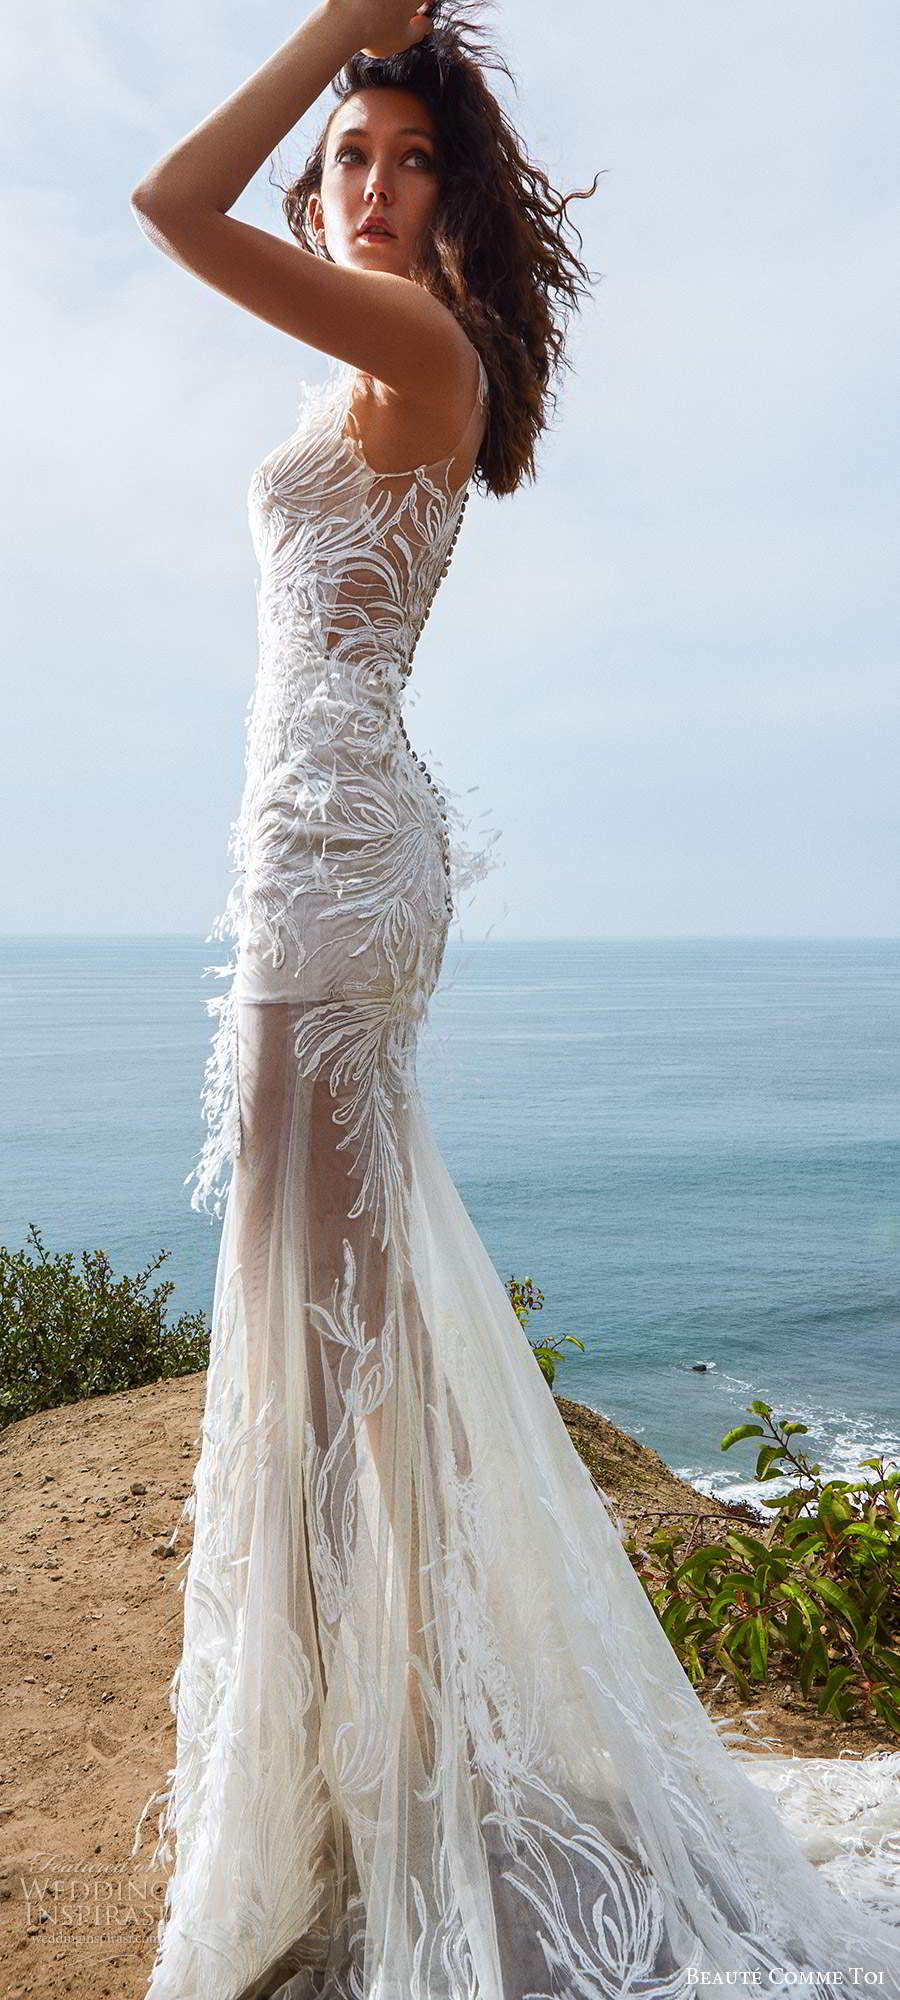 beaute comme toi f2020 bridal feather one shoulder sleeves illusion neckline full embellishment elegant glamorous fit and flare sheath wedding dress lace button back medium train (8) sv